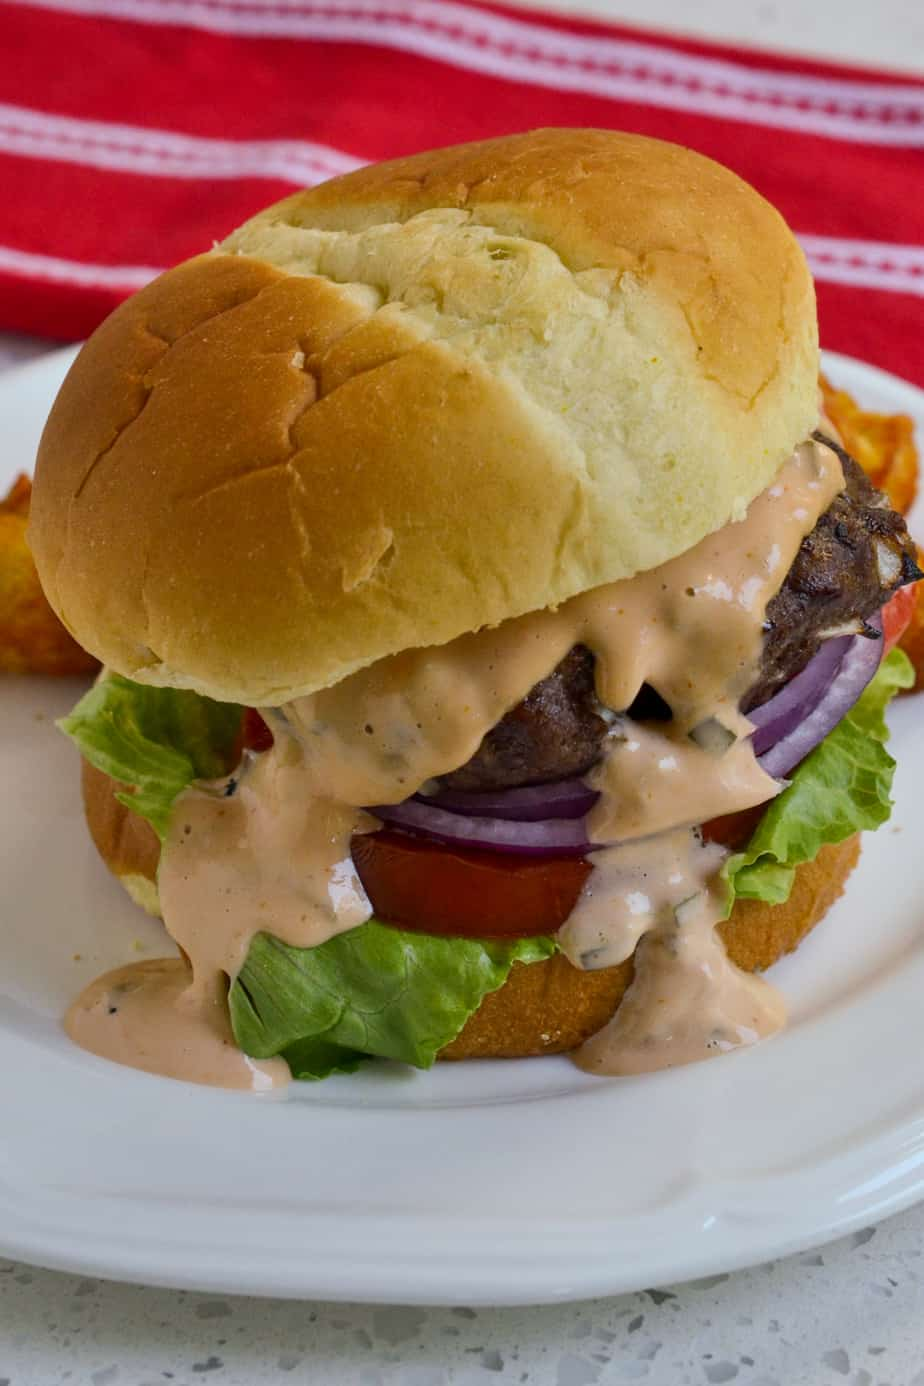 A grilled burger with burger sauce.